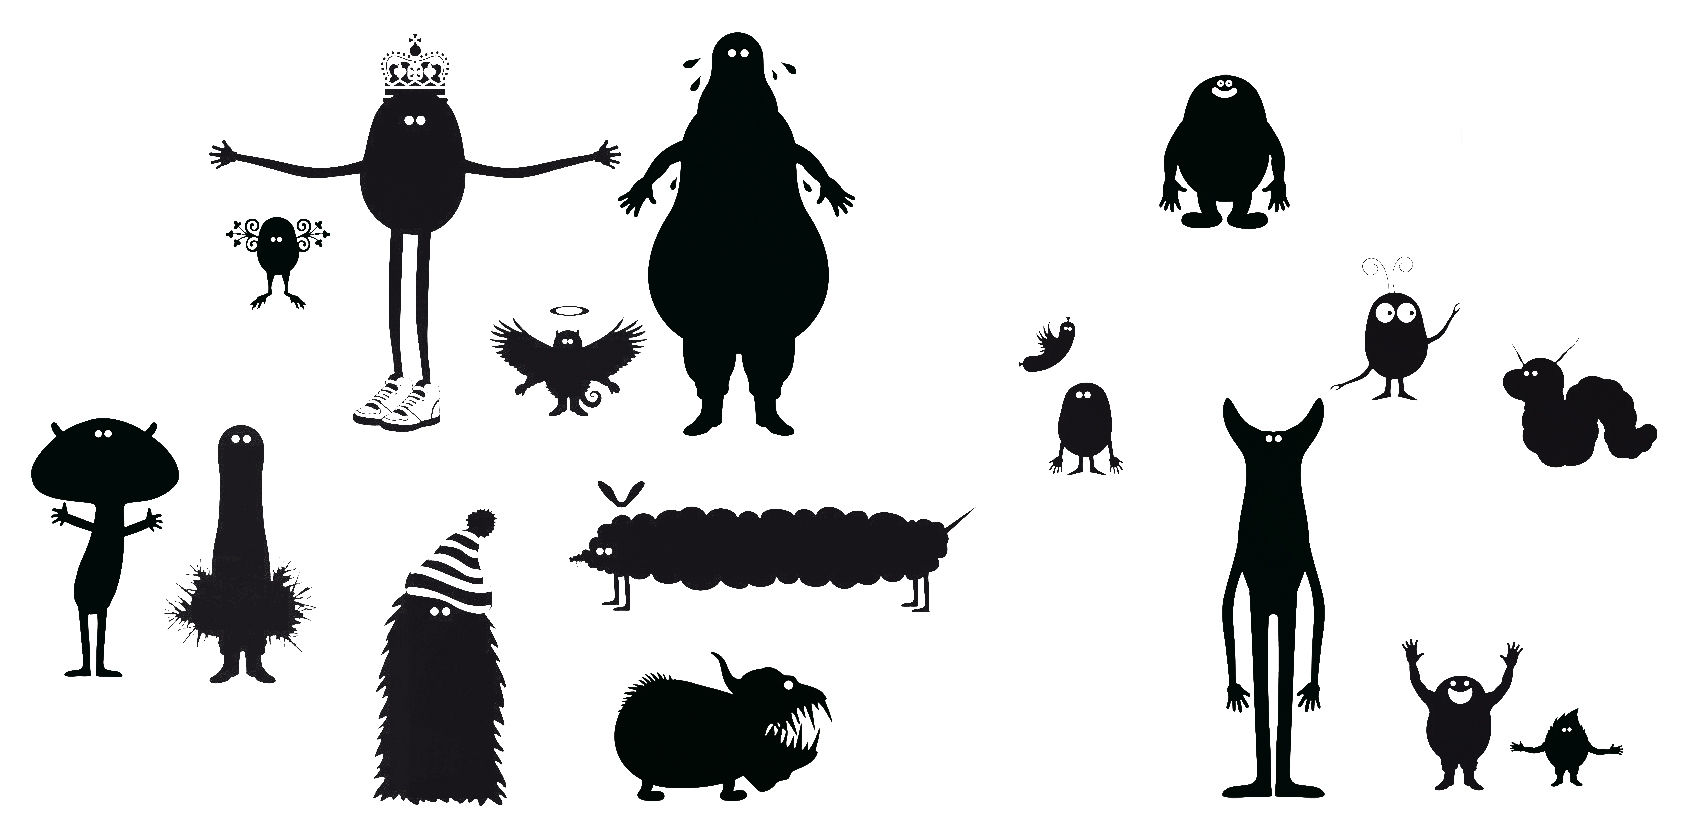 Decoration - Wallpaper & Wall Stickers - Potato Queen 2 Sticker by Domestic - Black - Vinal